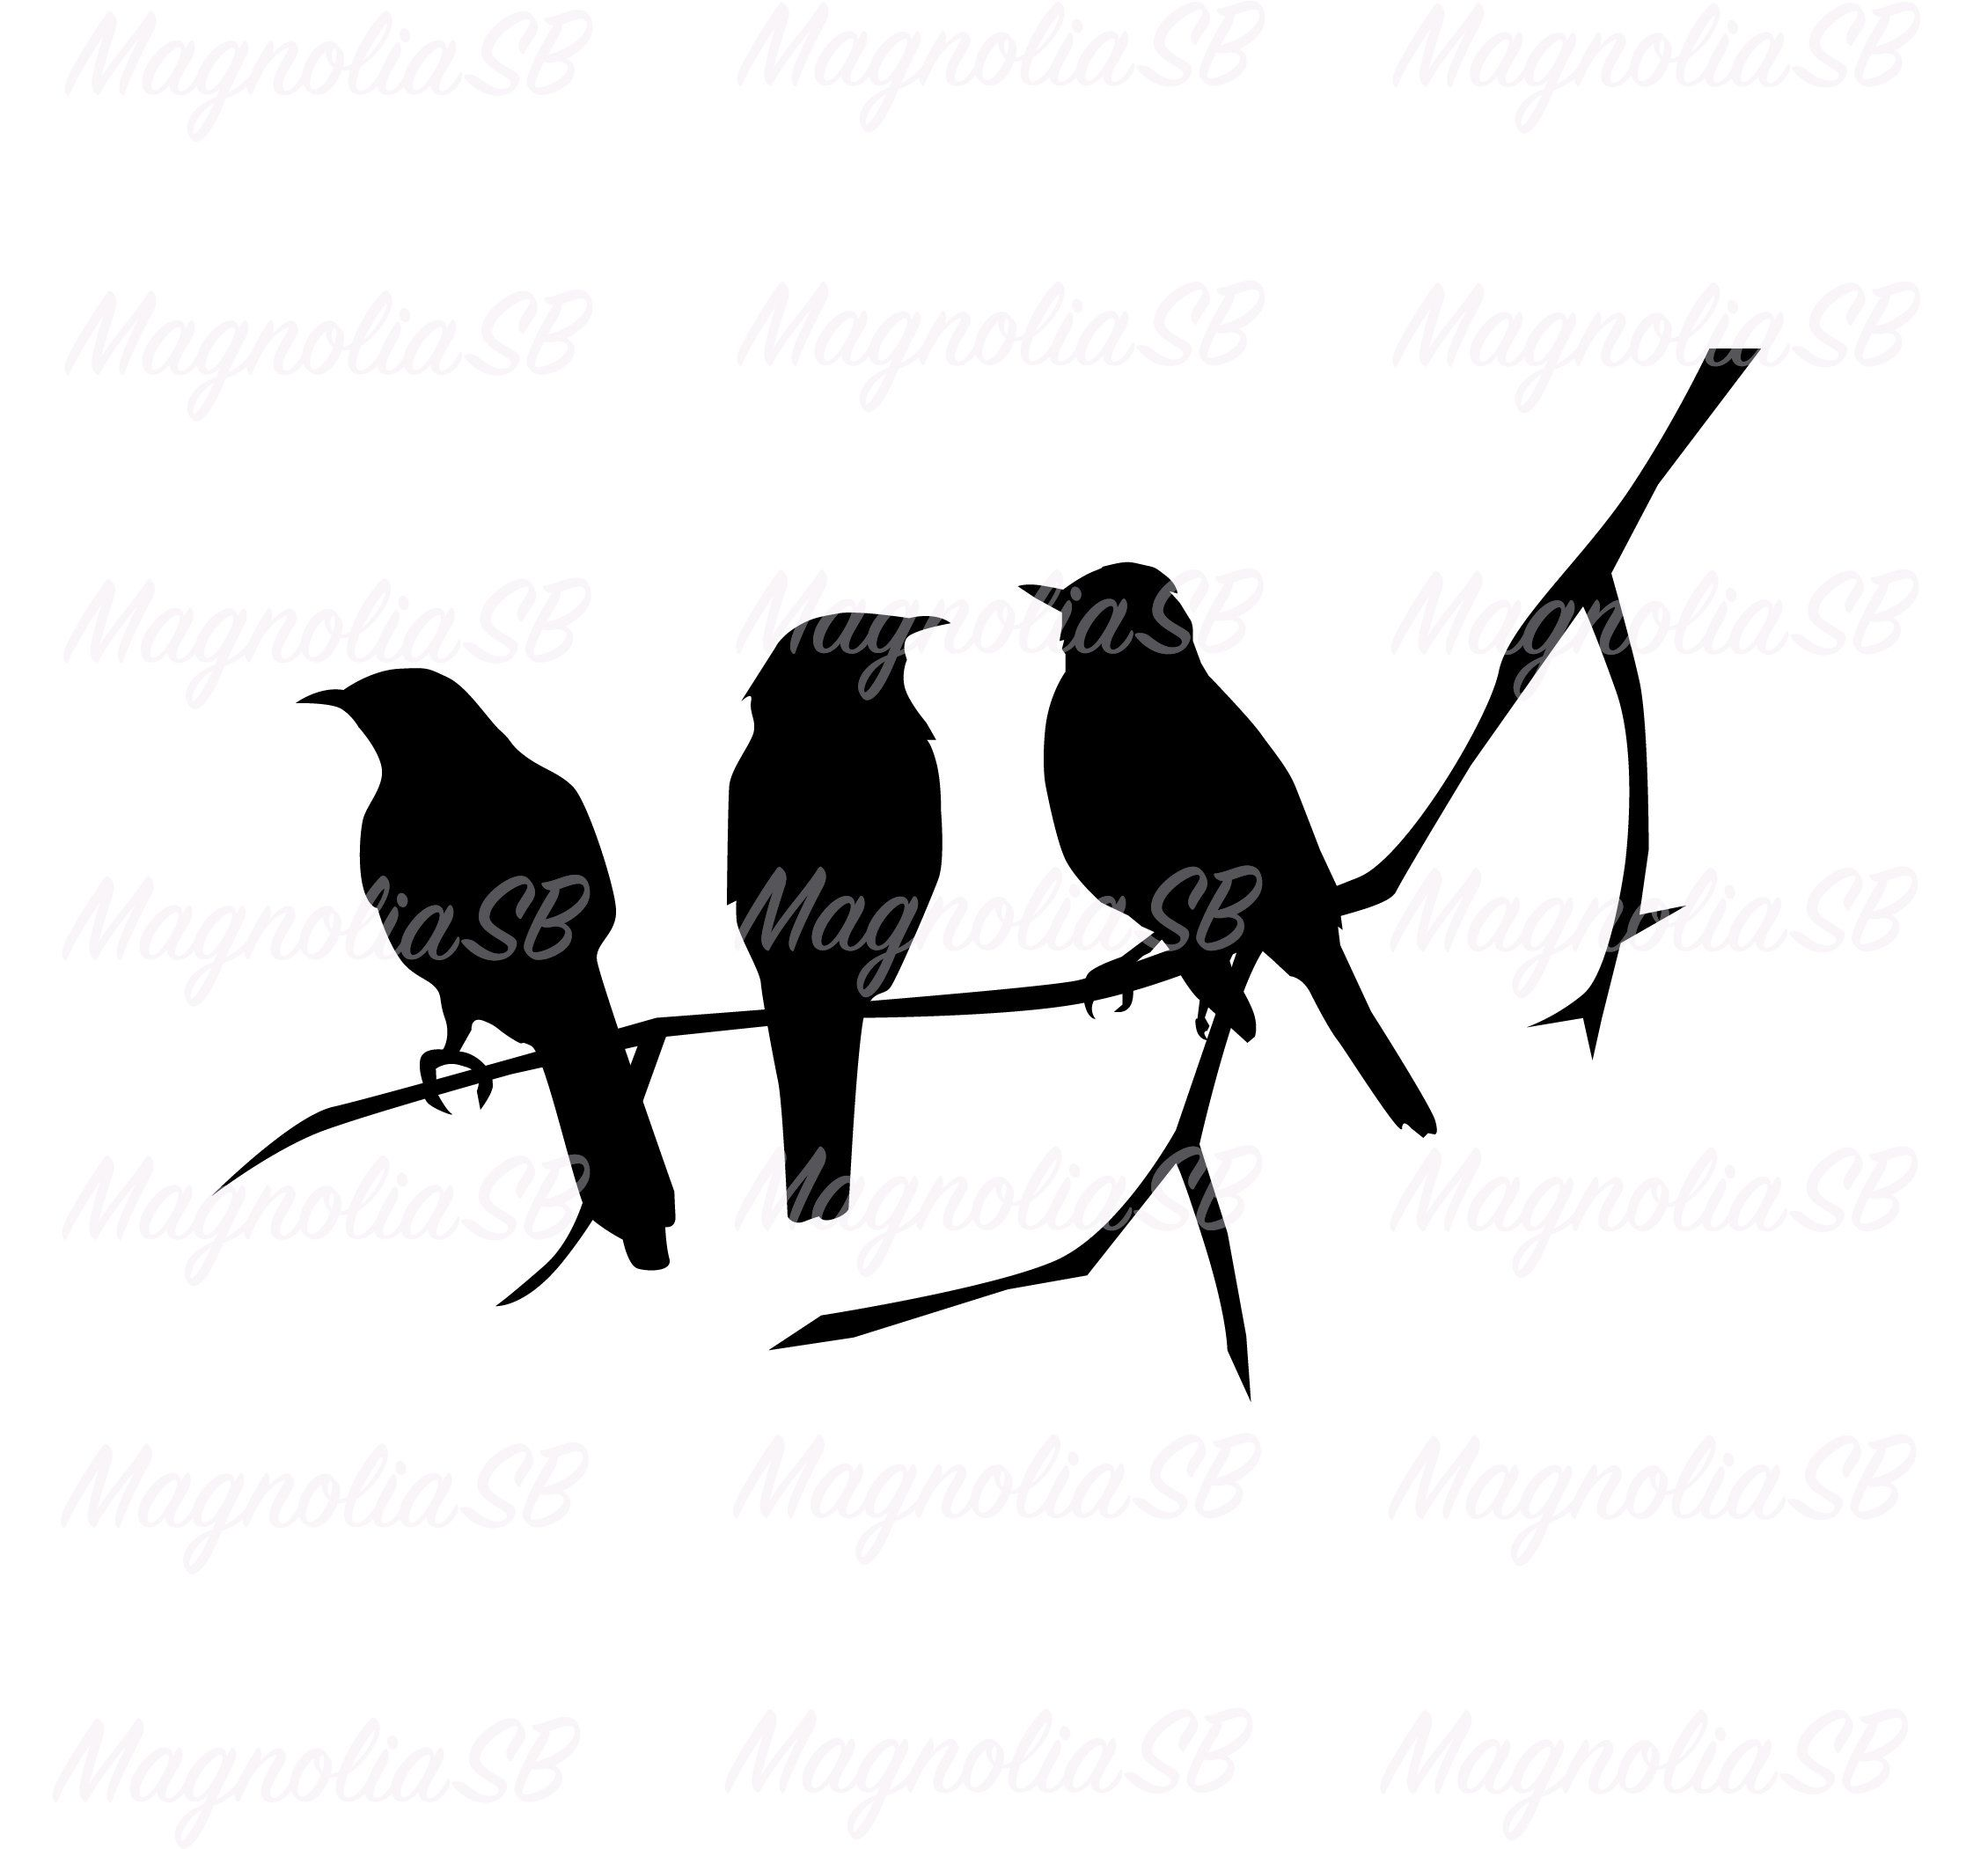 Birds On The Tree Branch Svg Birds Dxf Birds Clipart Bird Etsy In 2021 Bird Silhouette Art Silhouette Art Bird Clipart